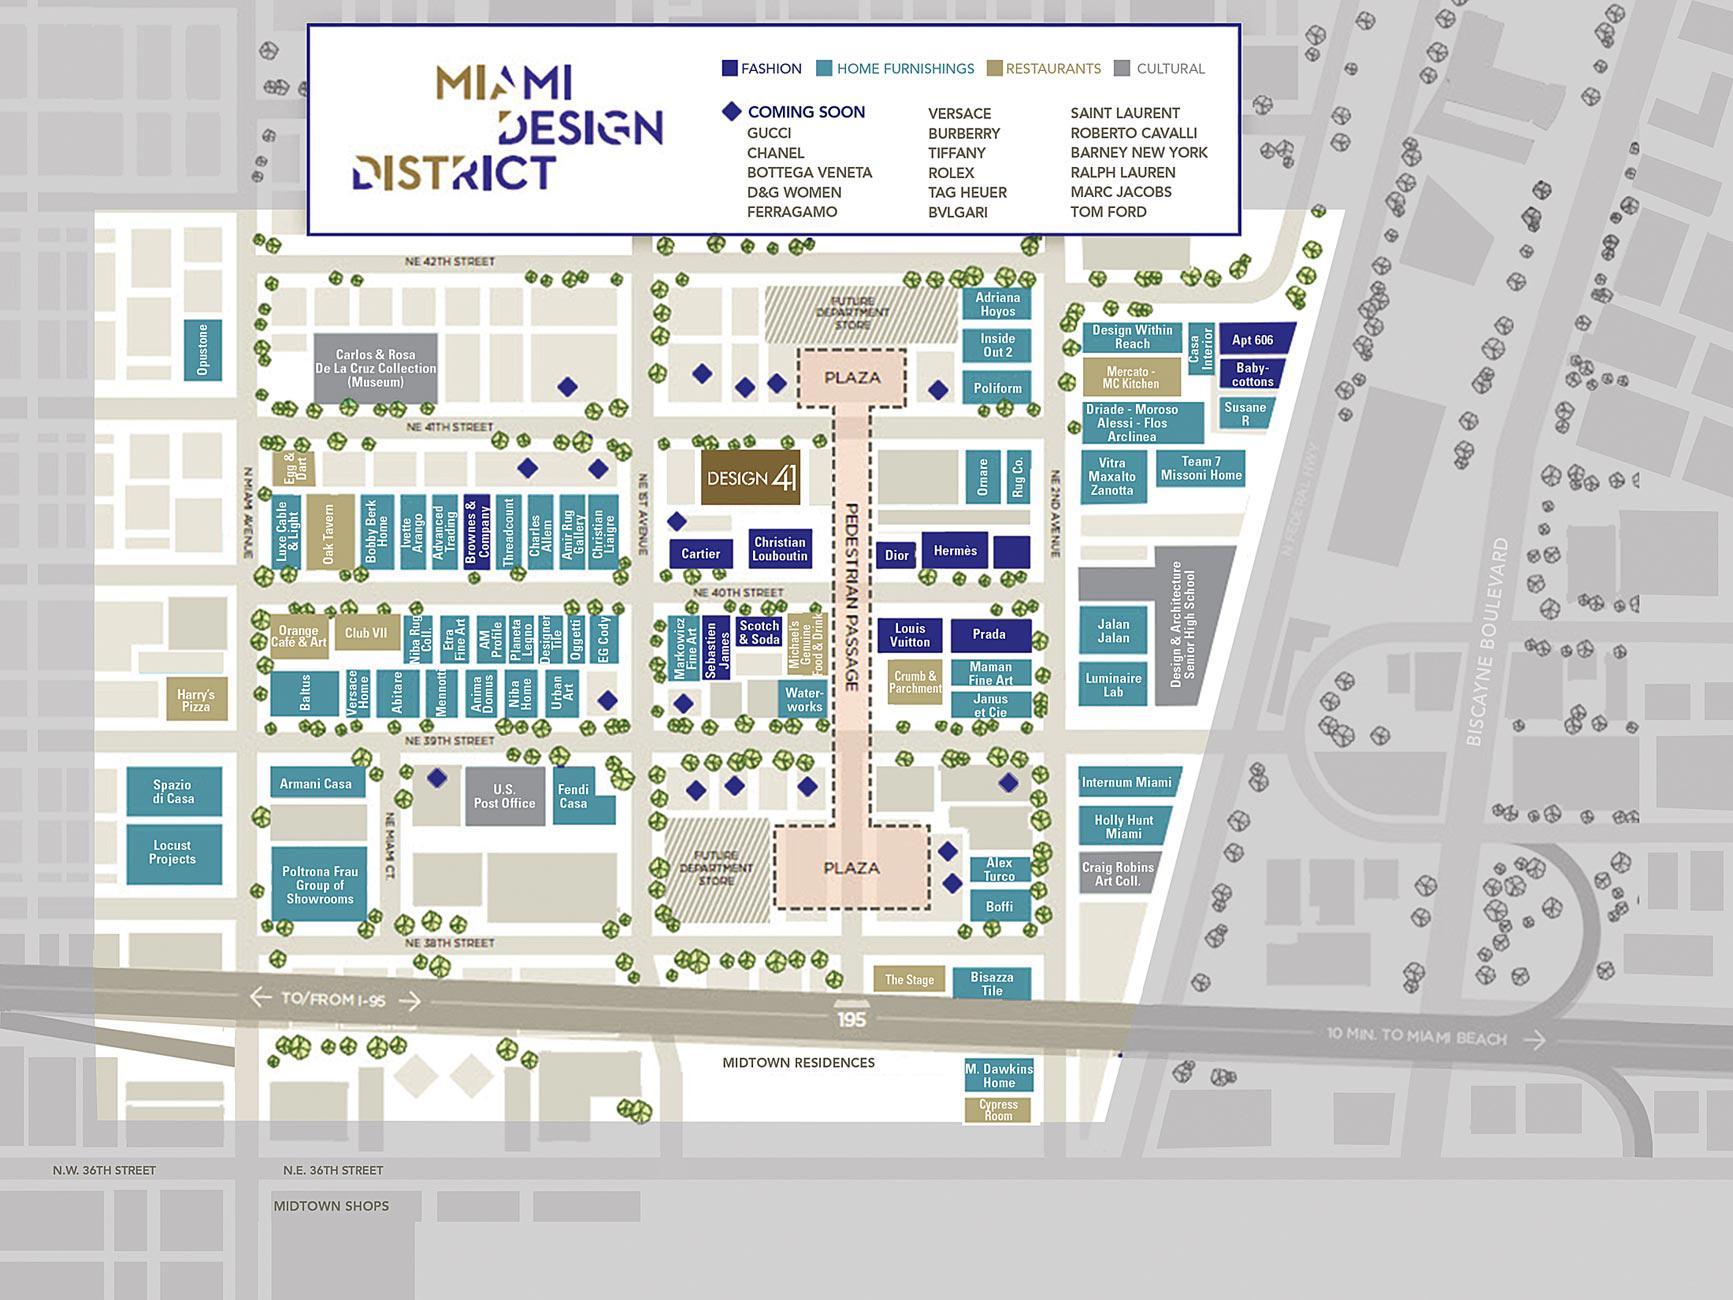 Miami Design District Map Miami design district map   Map of Miami design district (Florida